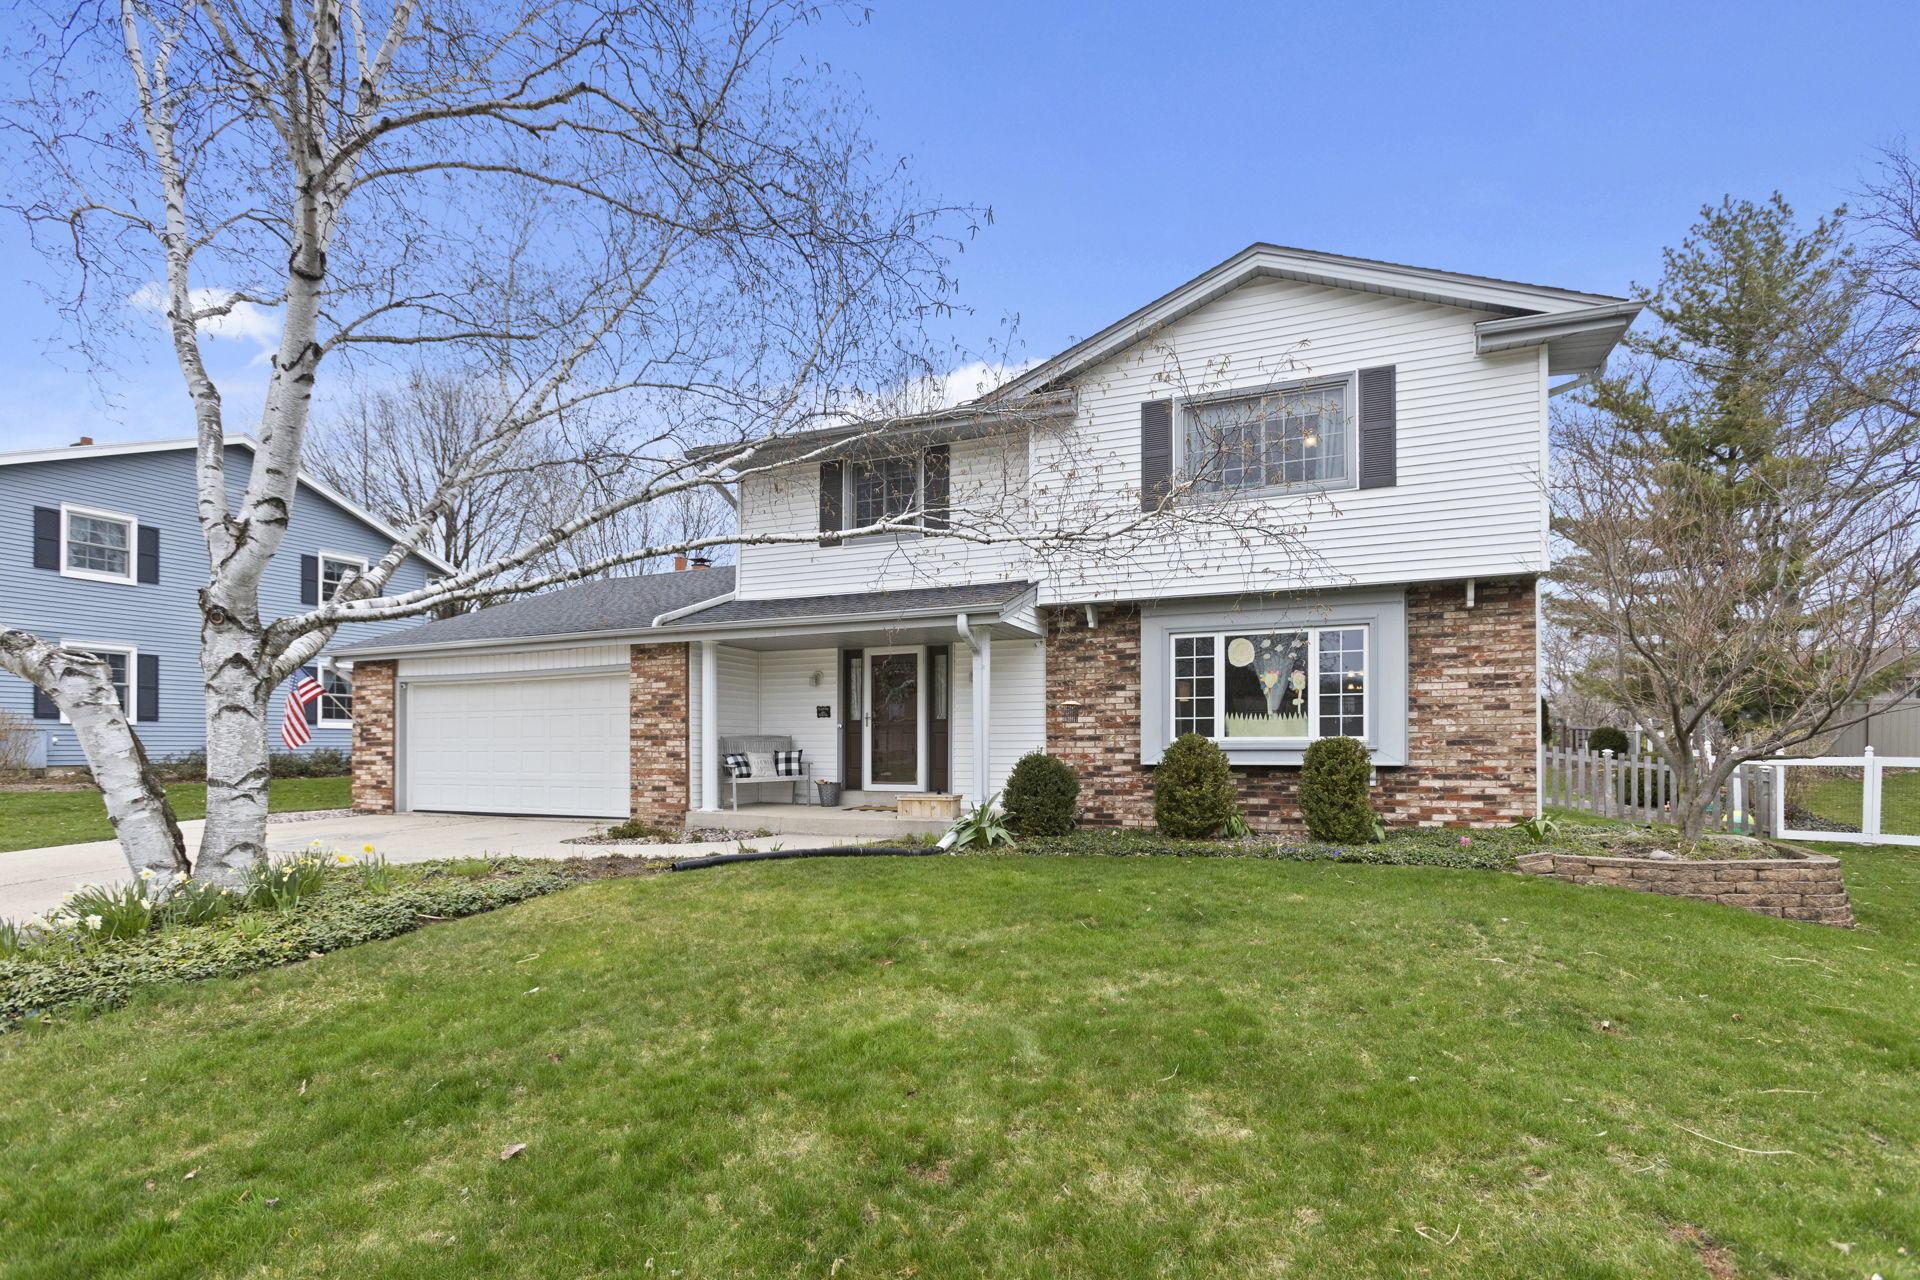 2016 Cobblestone Ct, Waukesha, Wisconsin 53188, 4 Bedrooms Bedrooms, ,2 BathroomsBathrooms,Single-Family,For Sale,Cobblestone Ct,1686255